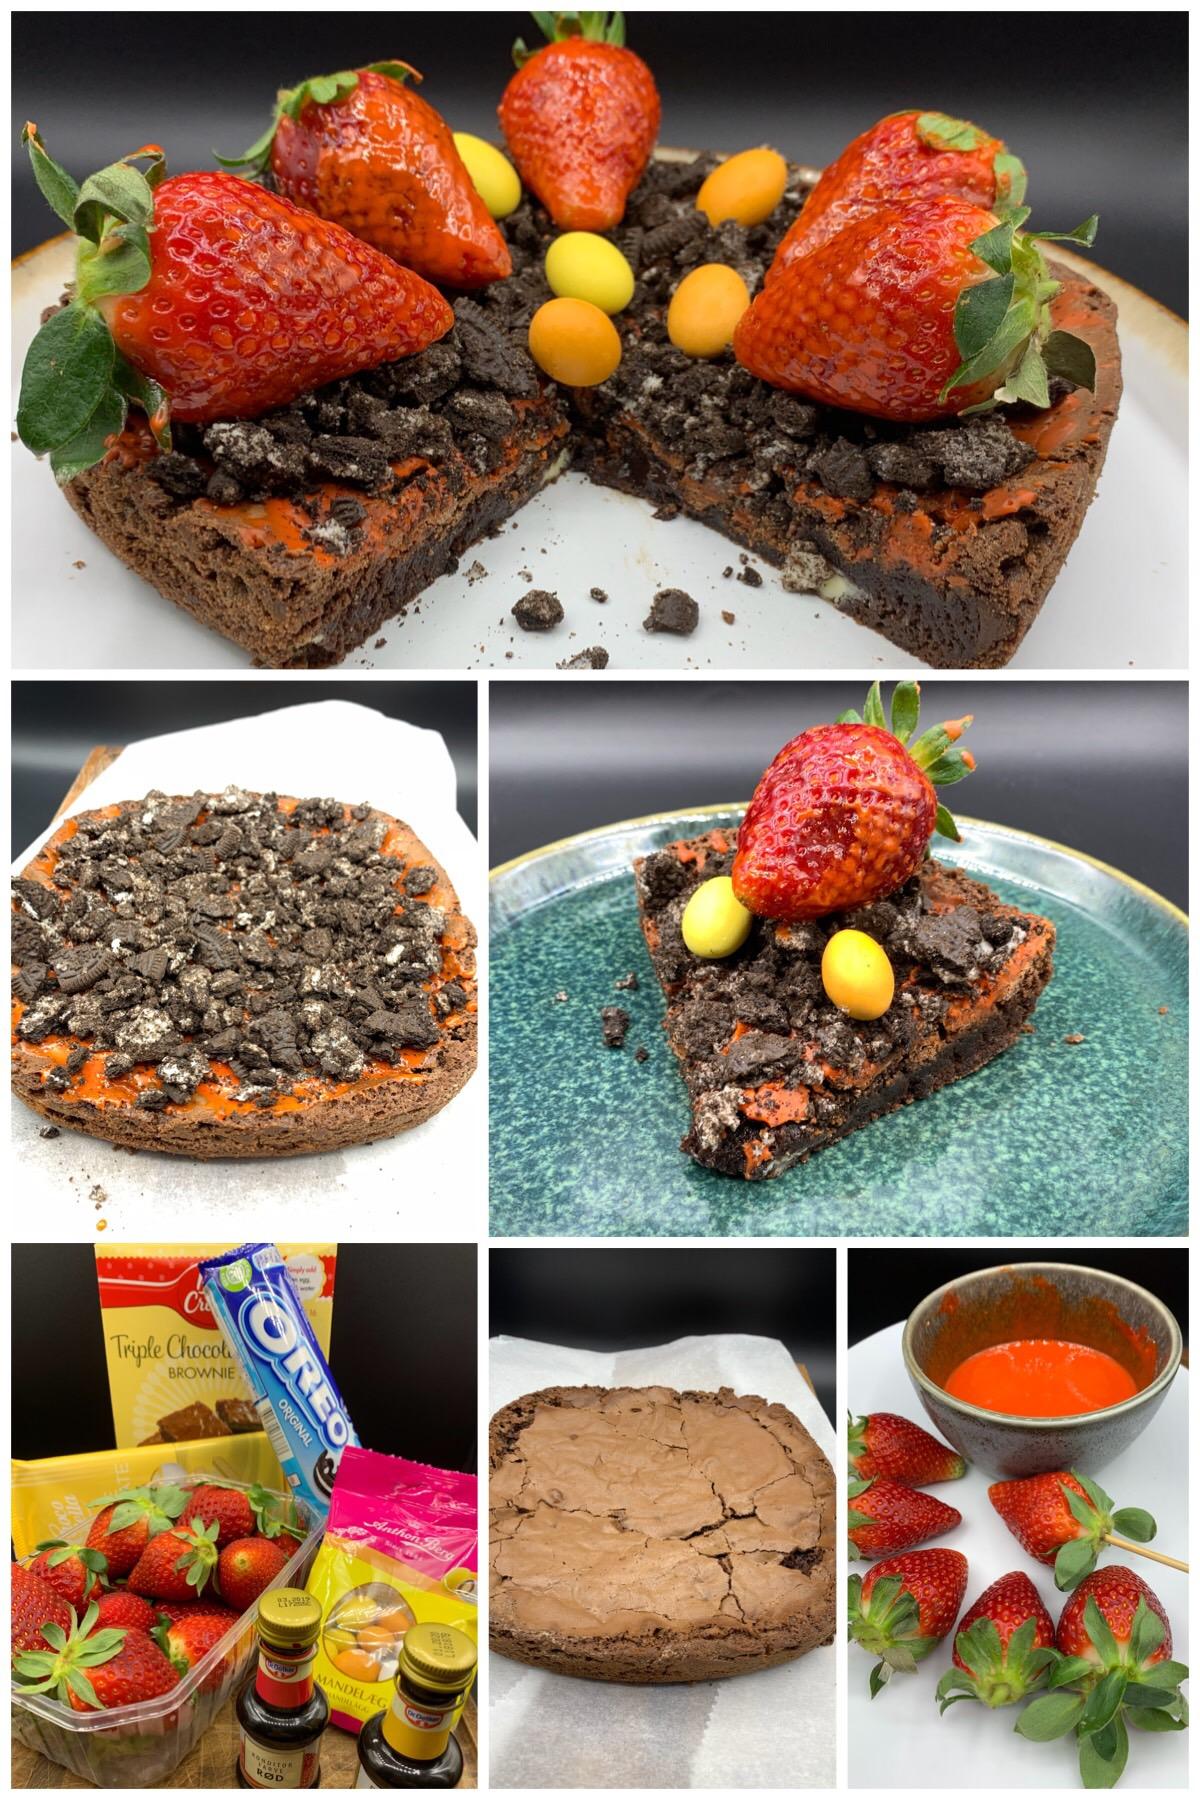 Brownie med jordbær, påskeæg og Oreos